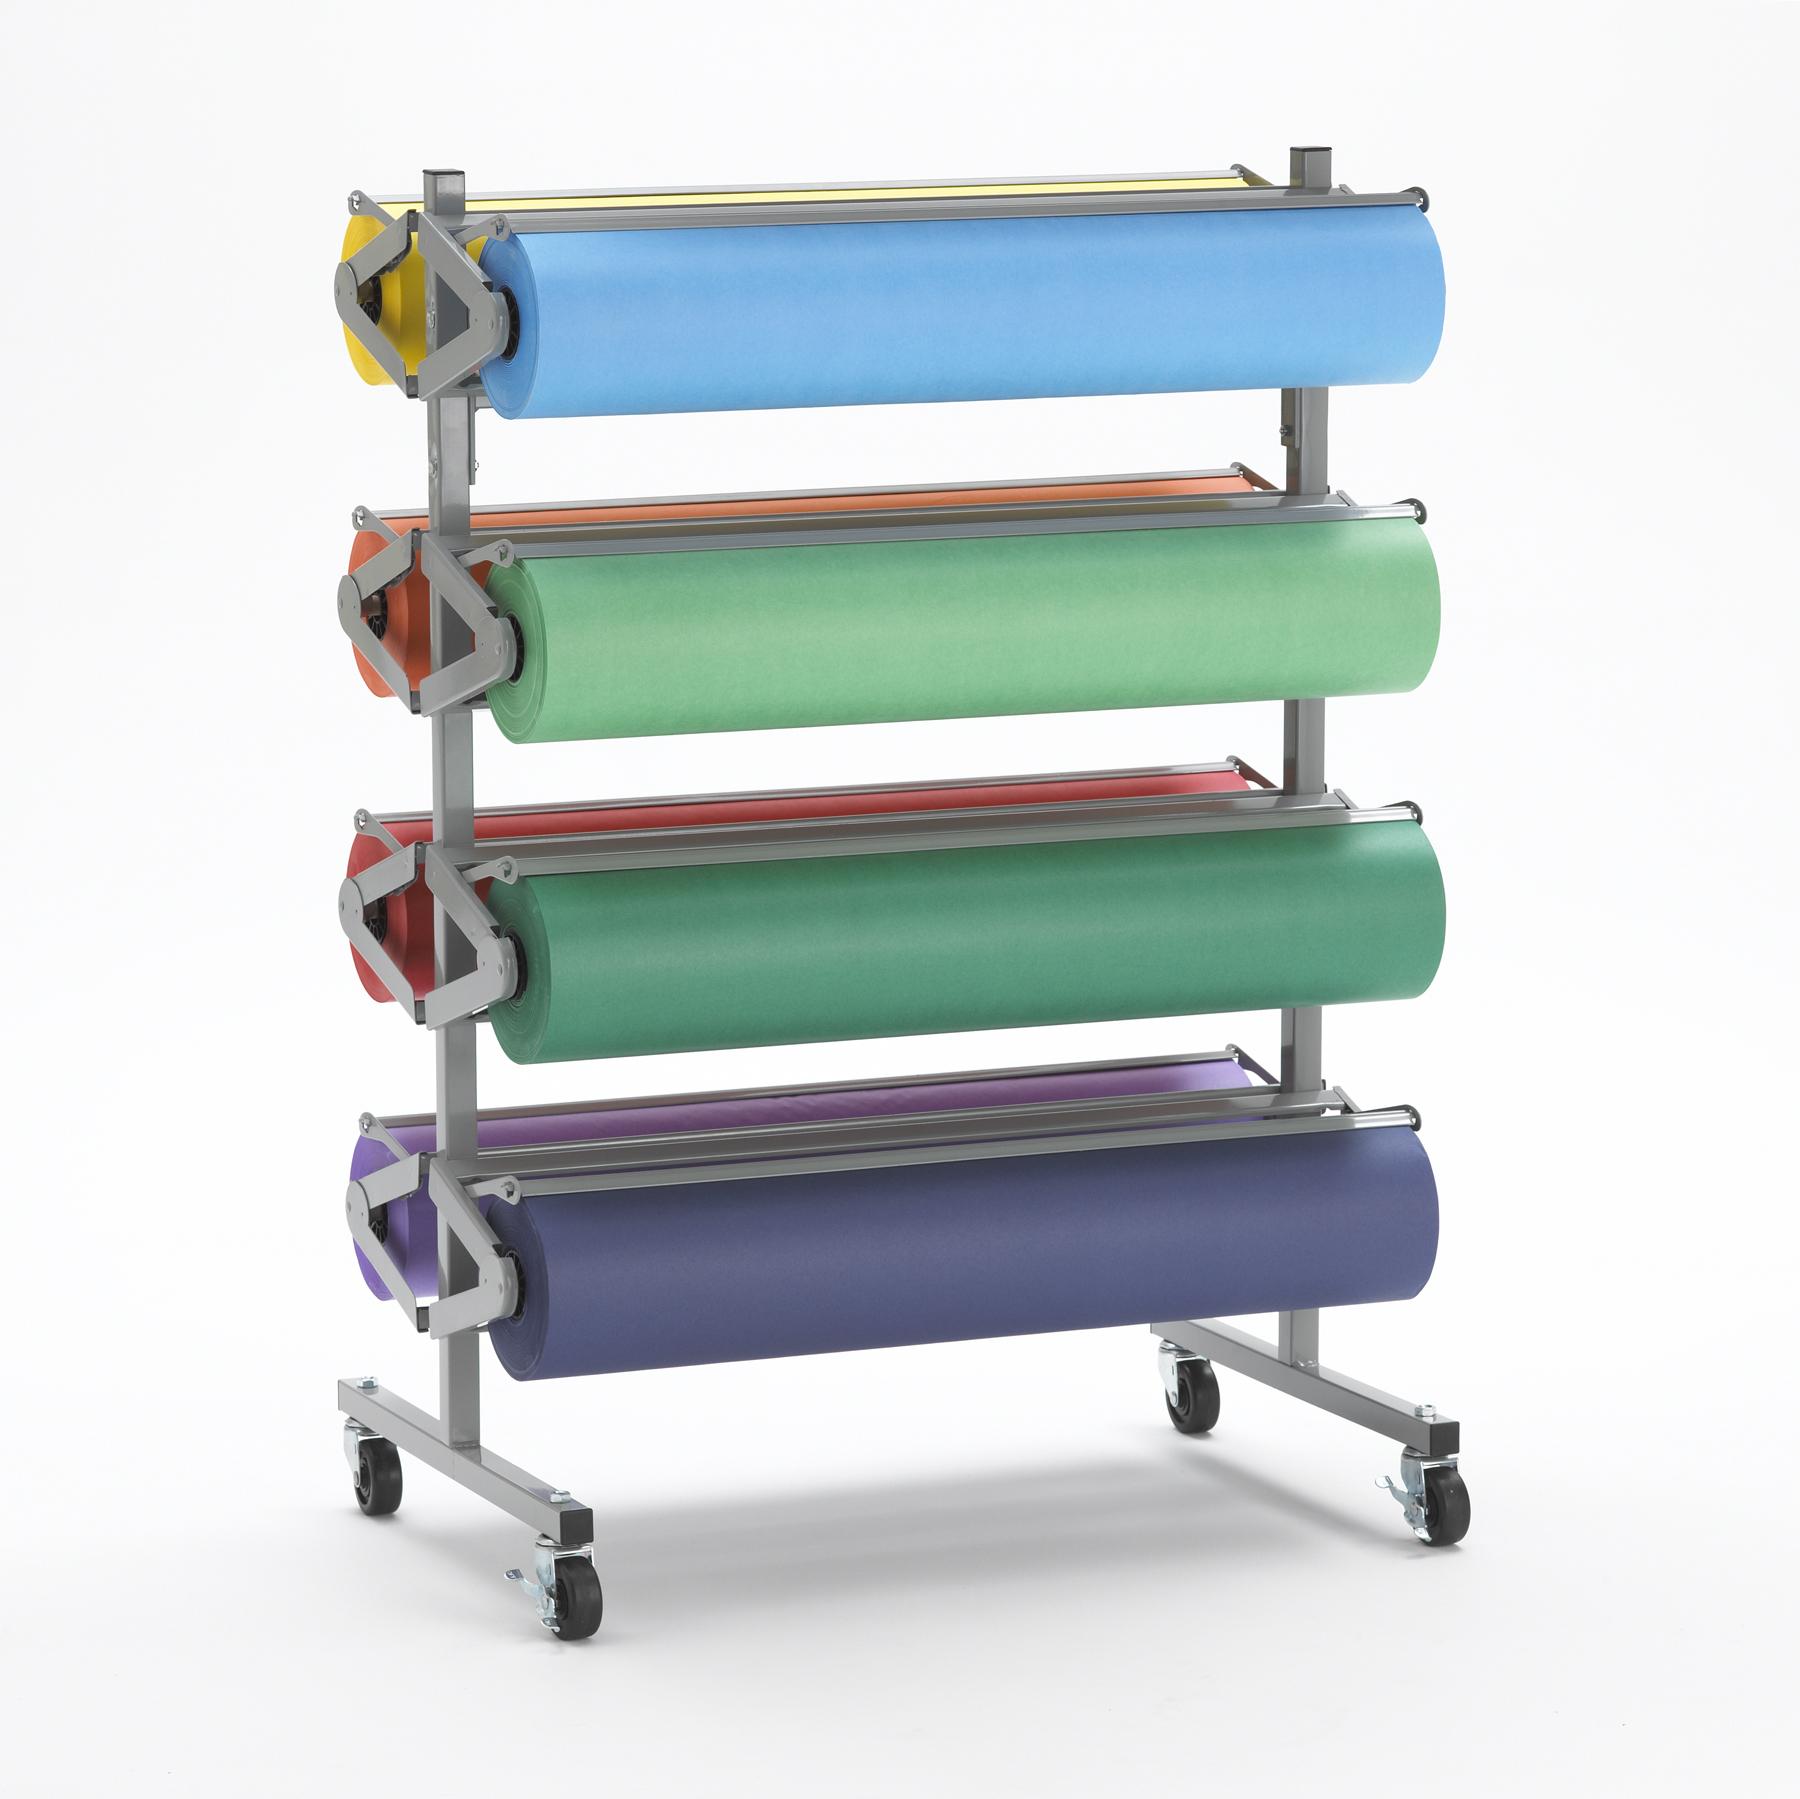 Standard Rola-Rack